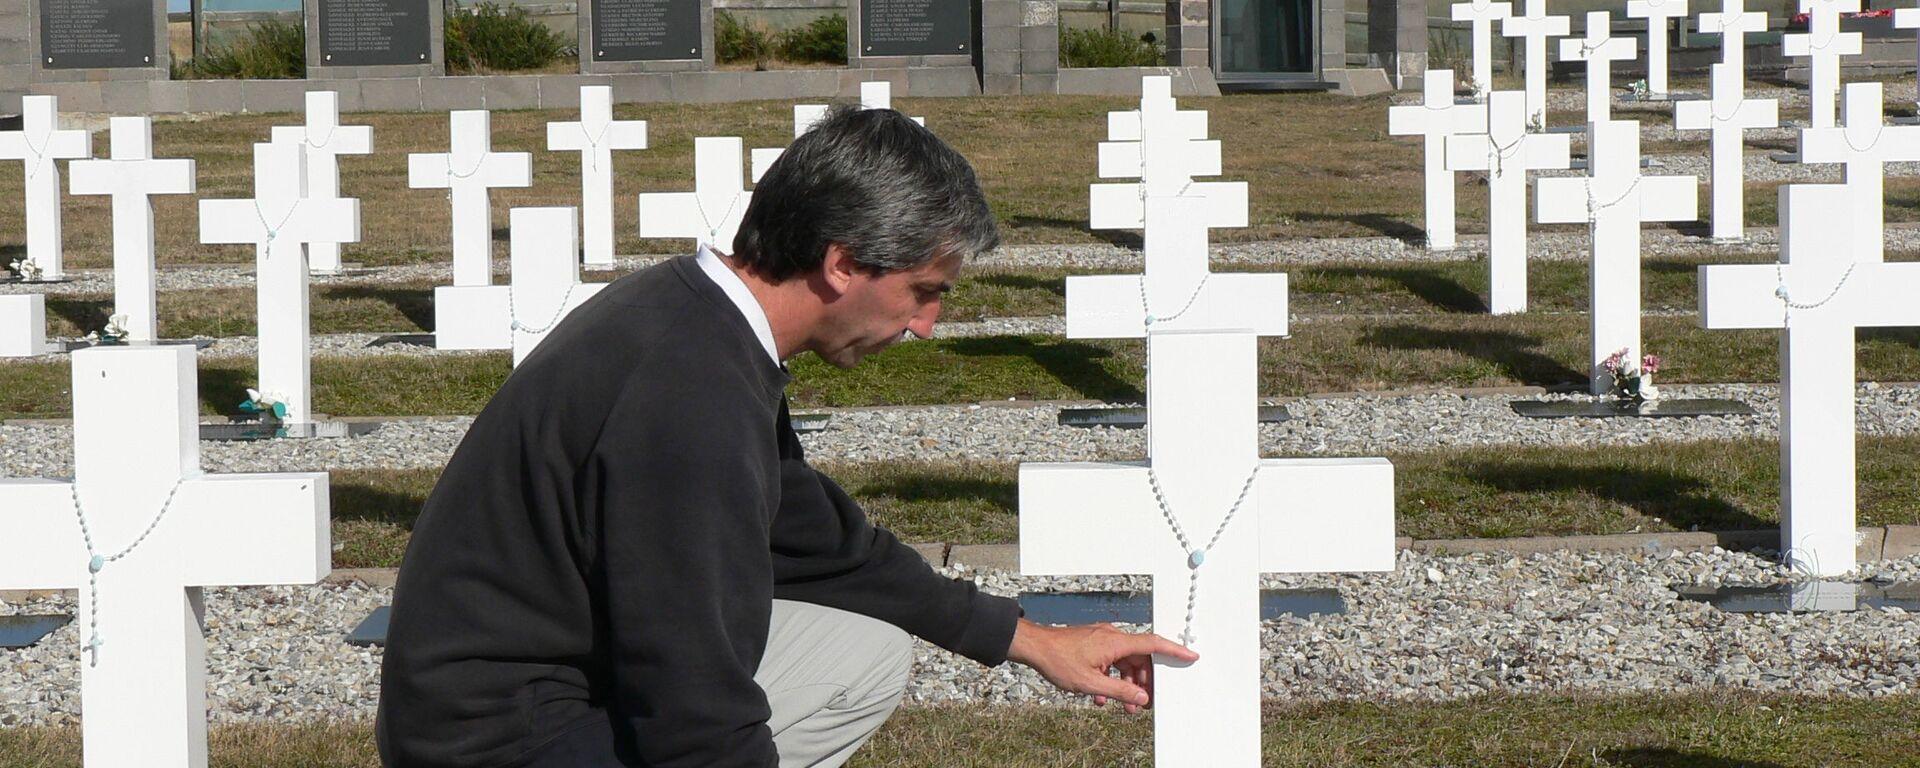 Julio Aro en el Cementerio de Darwin, Islas Malvinas - Sputnik Mundo, 1920, 04.12.2020